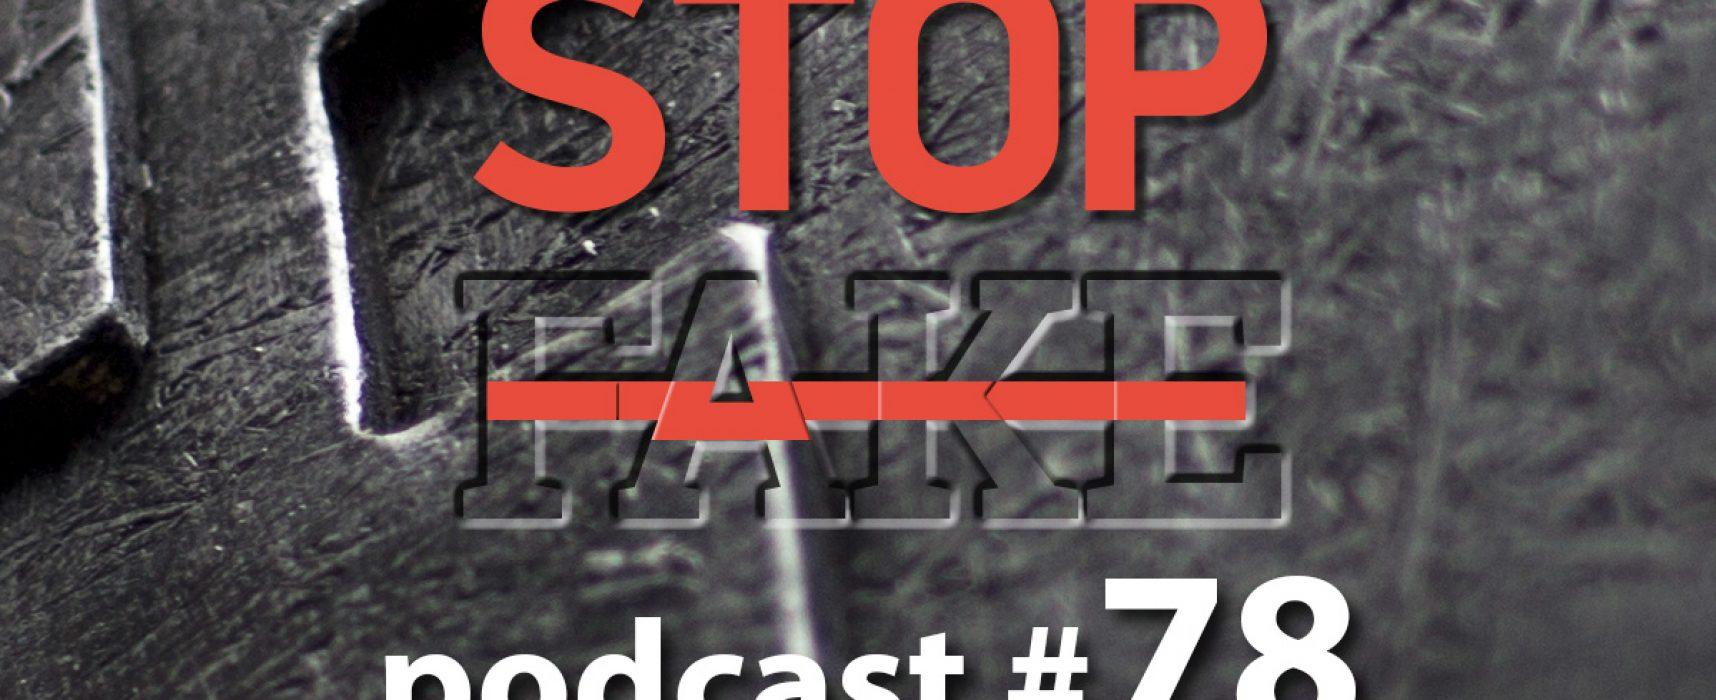 StopFake podcast #78